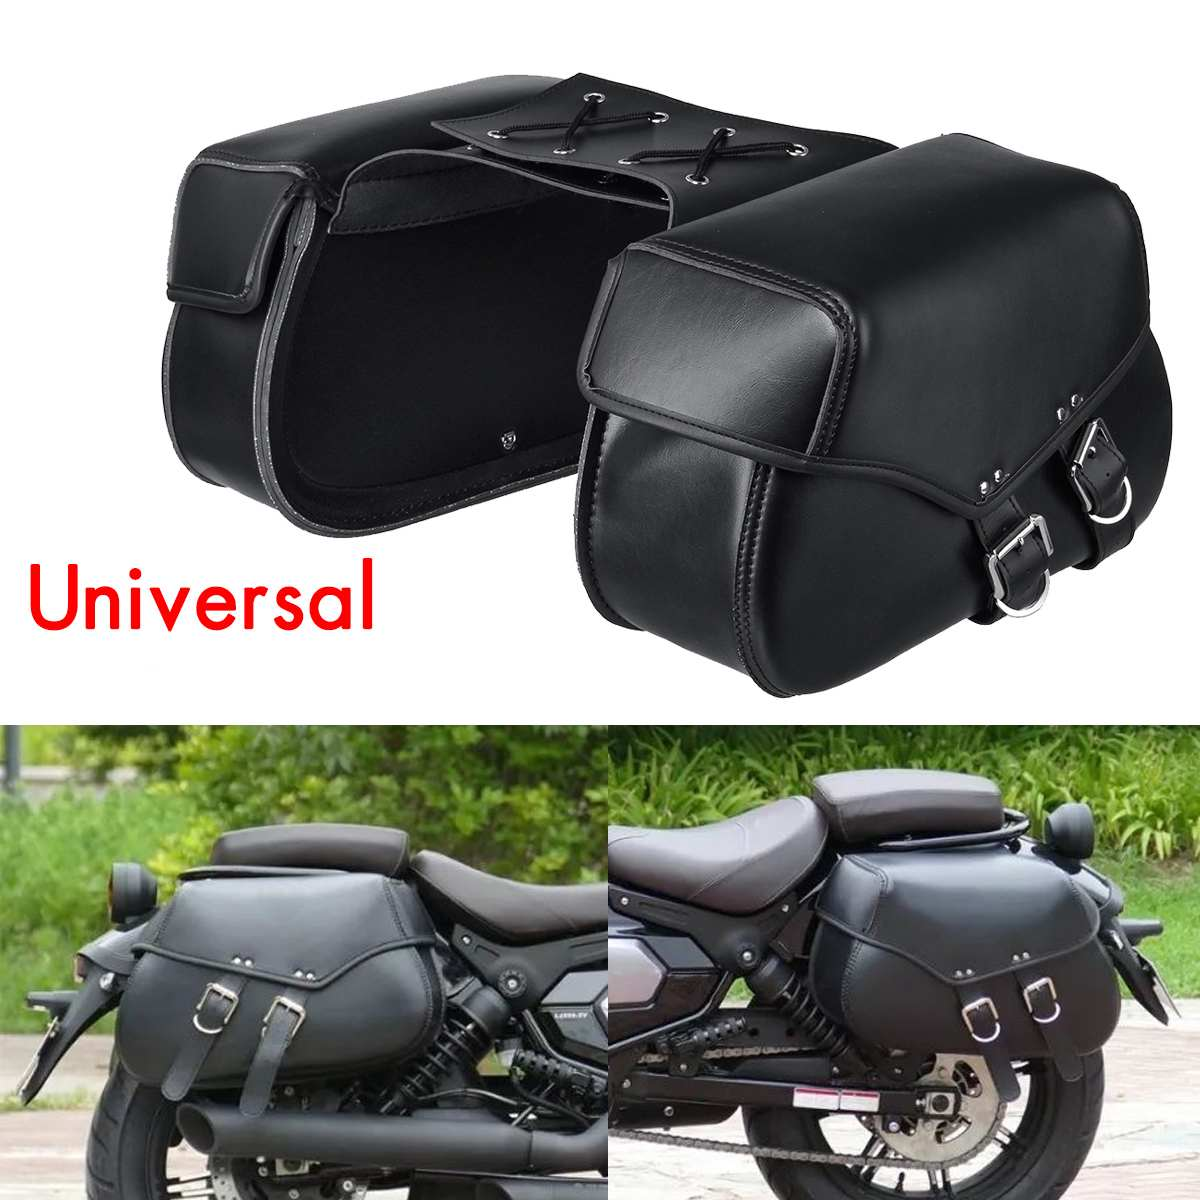 Bolsas de sillín de motocicleta a prueba de agua, herramienta alforjas de equipaje, bolsa lateral de cuero de PU para Honda/Yamaha/Suzuki